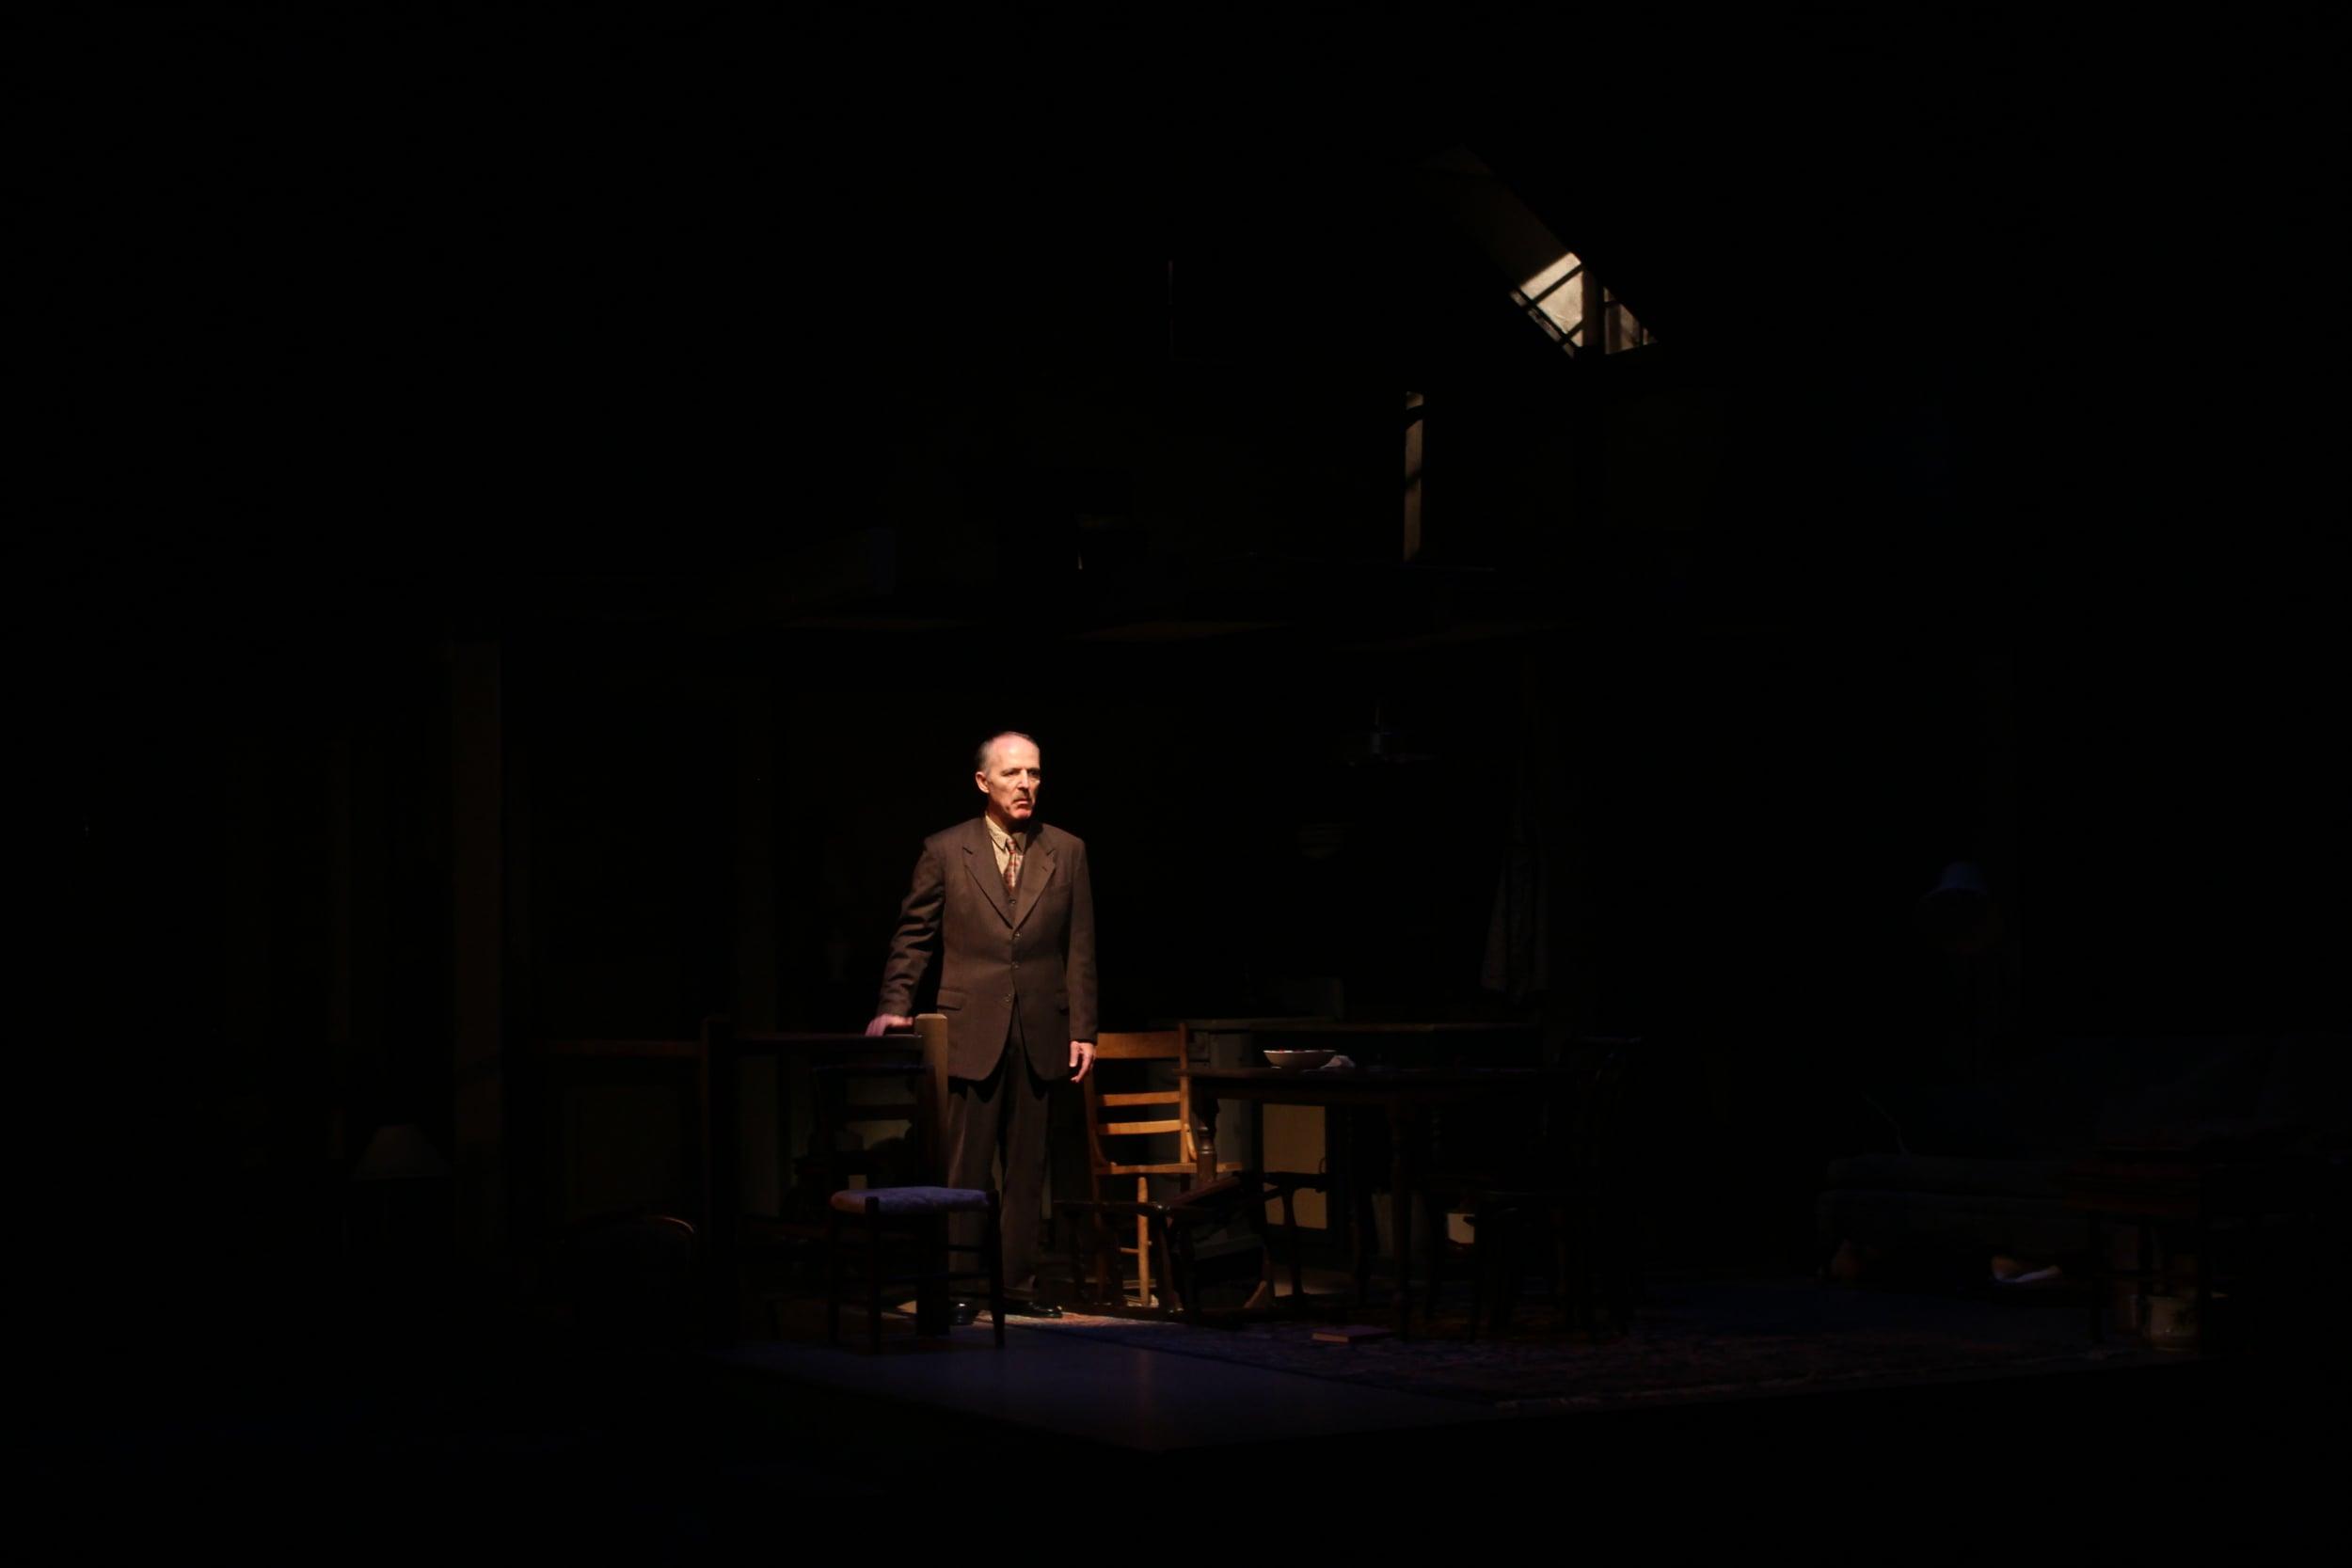 Otto Frank returns to the Annex